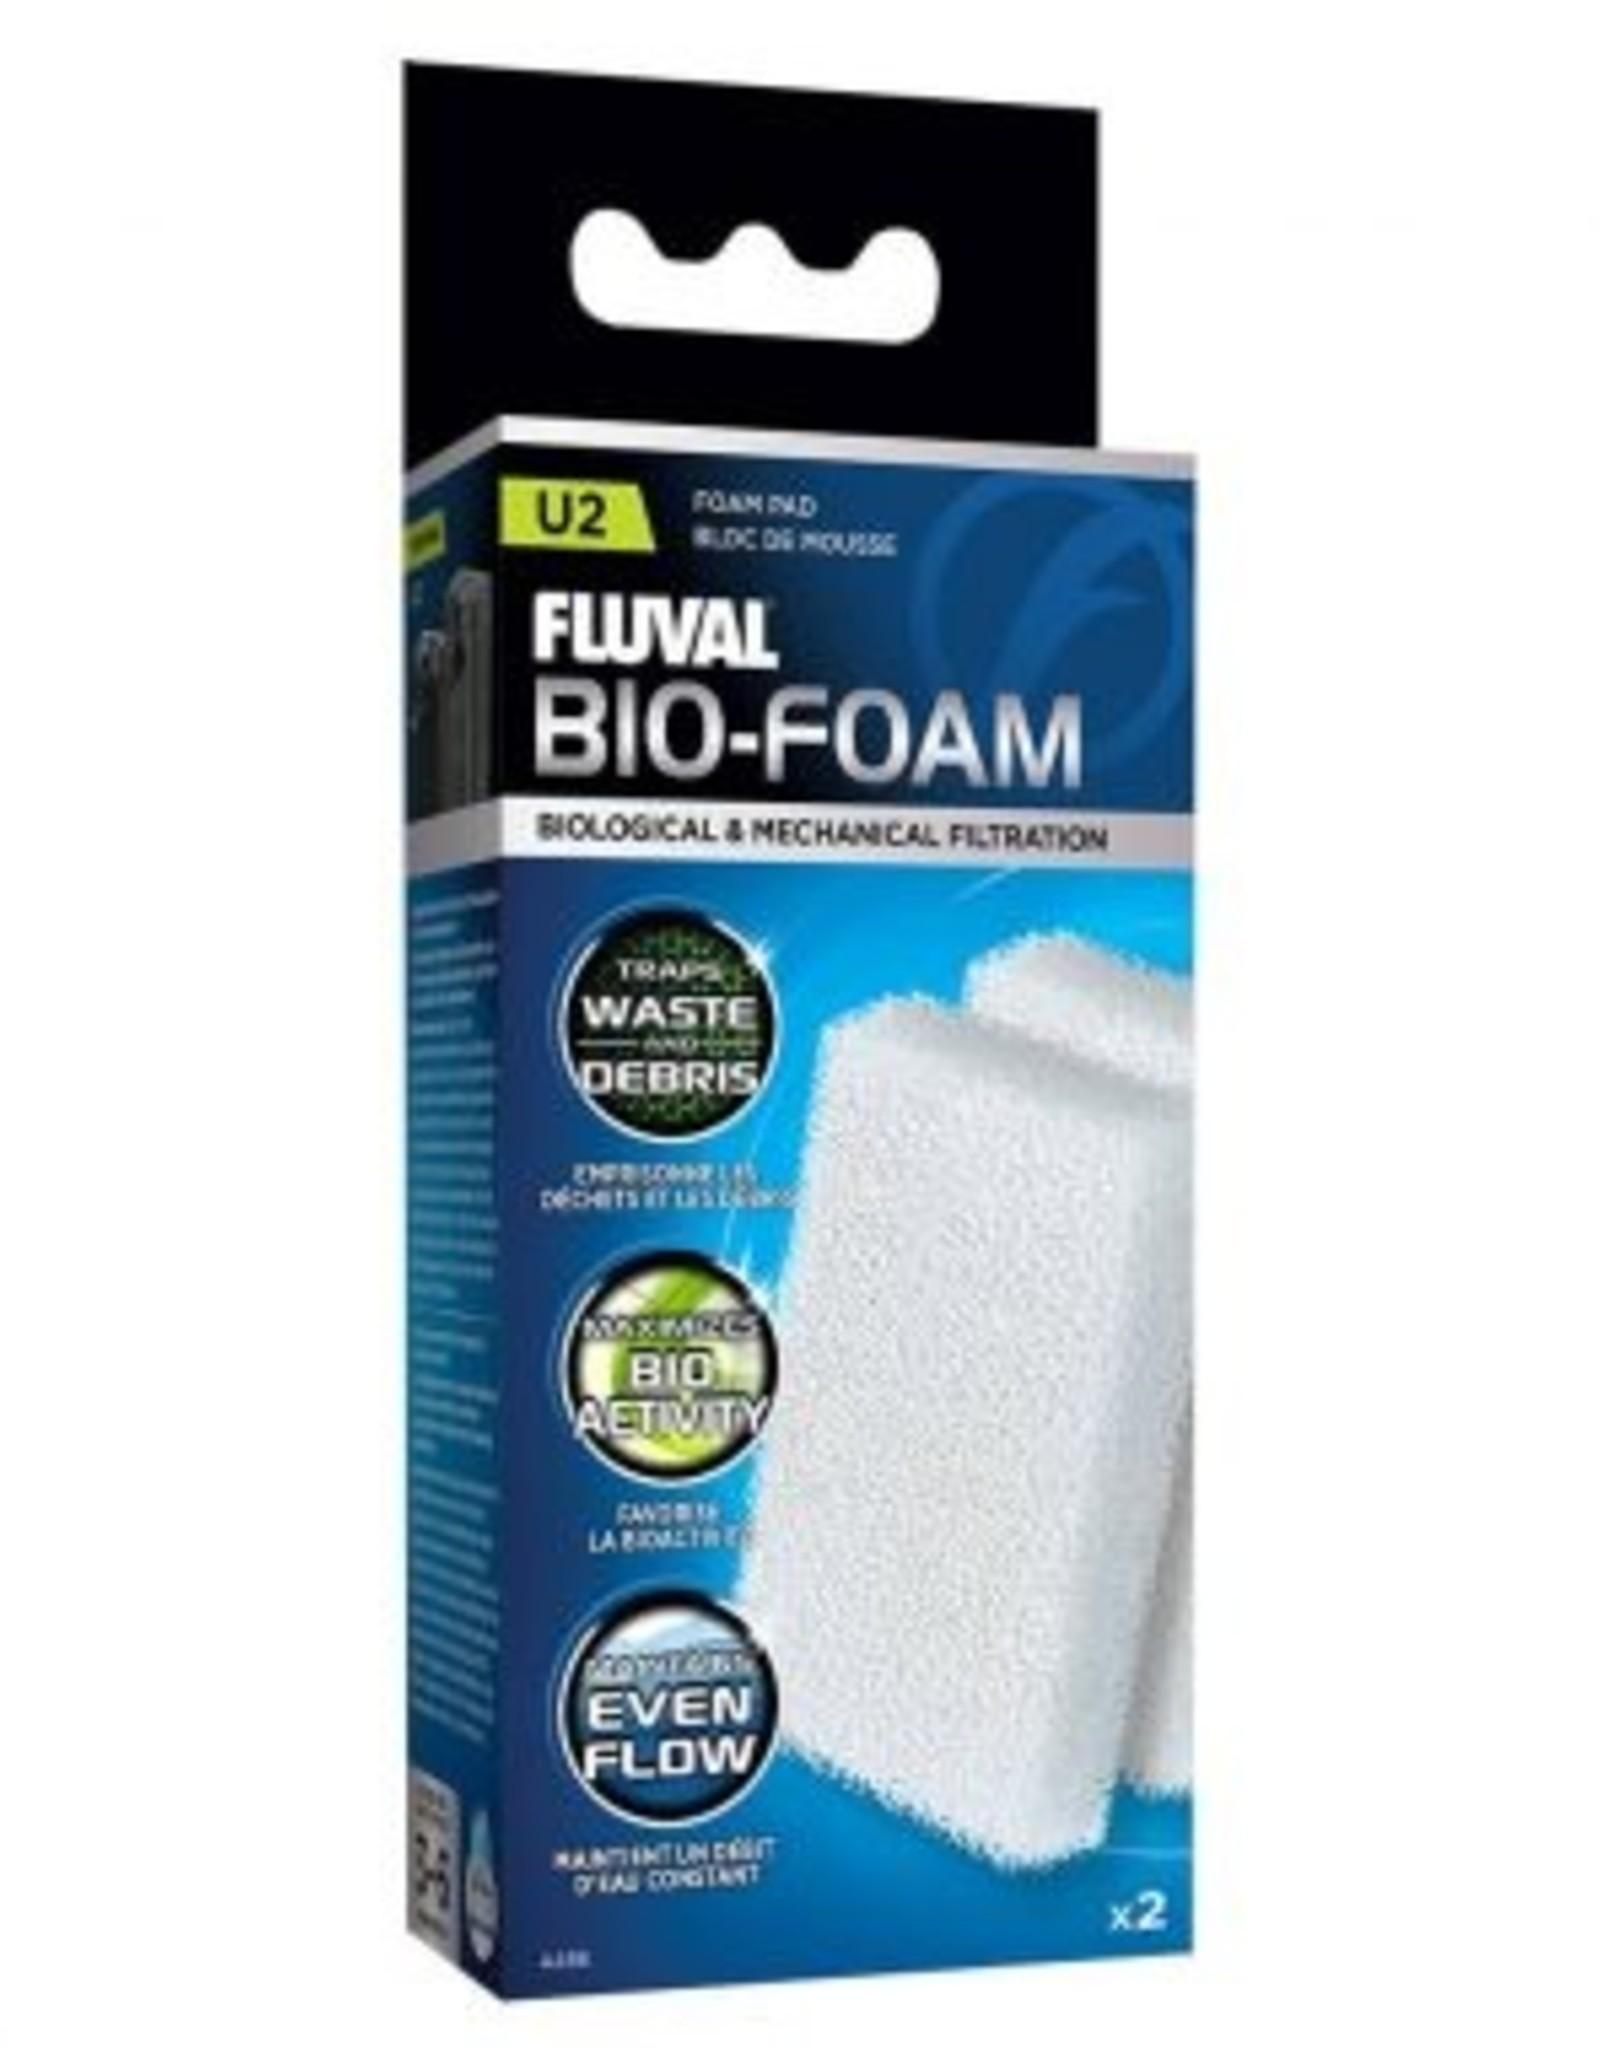 HAGEN FLUVAL U2 BIO-FOAM PAD